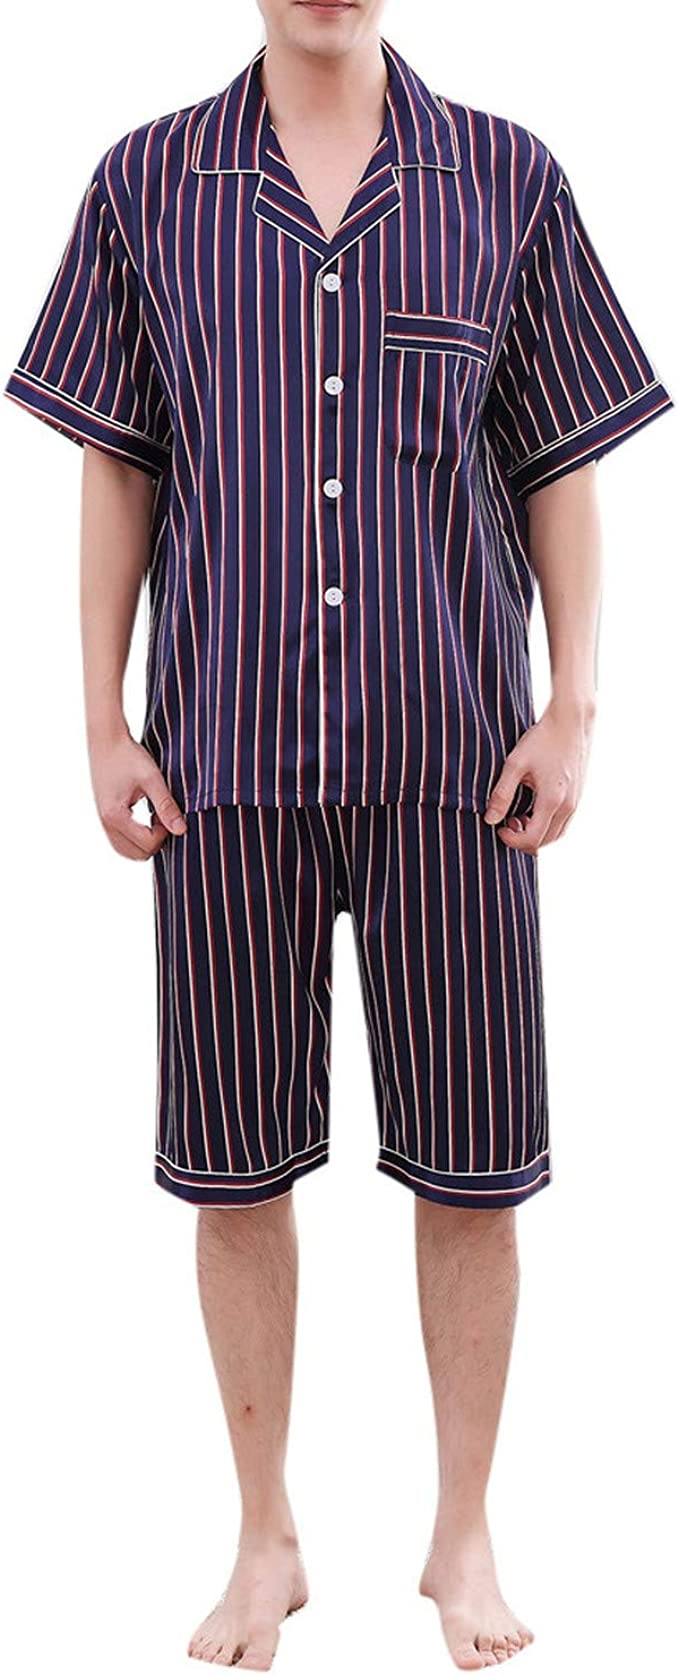 Men Pyjama Set Satin Silk Summer Suit Short Sleeve Sleepwear Spring Nightgown